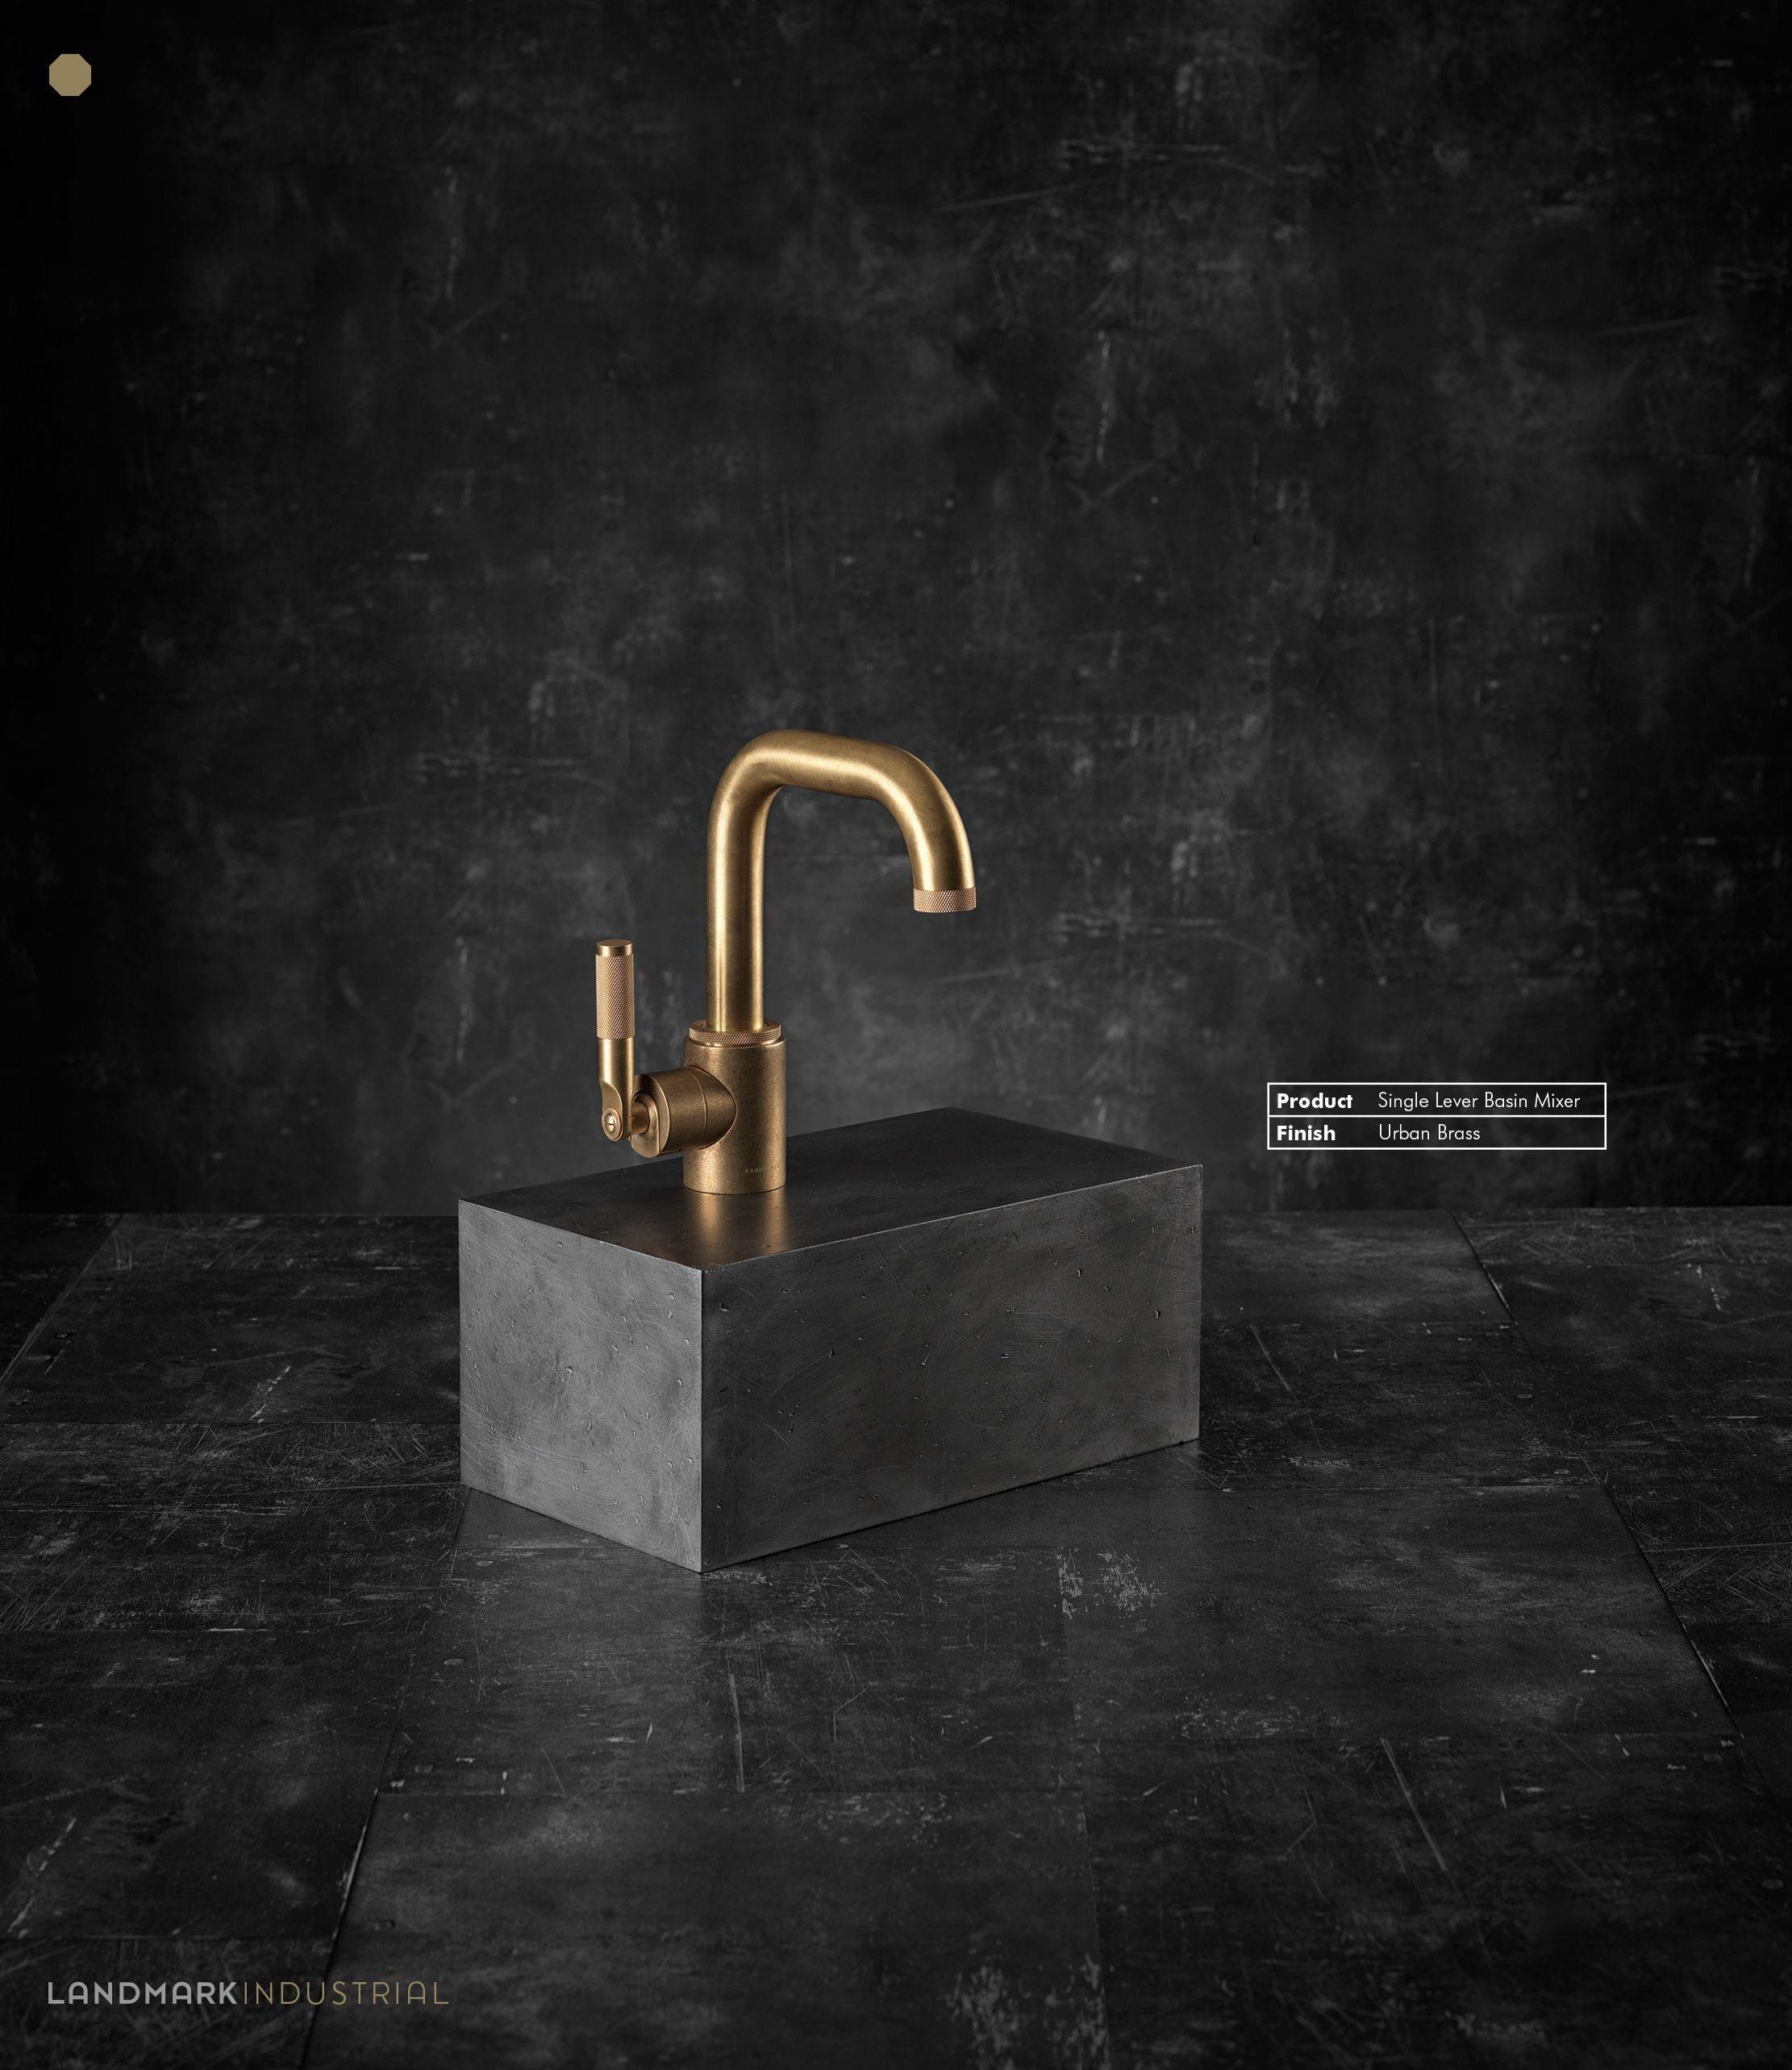 samuel heath landmark industrial - | Bathroom - Faucets | Pinterest ...